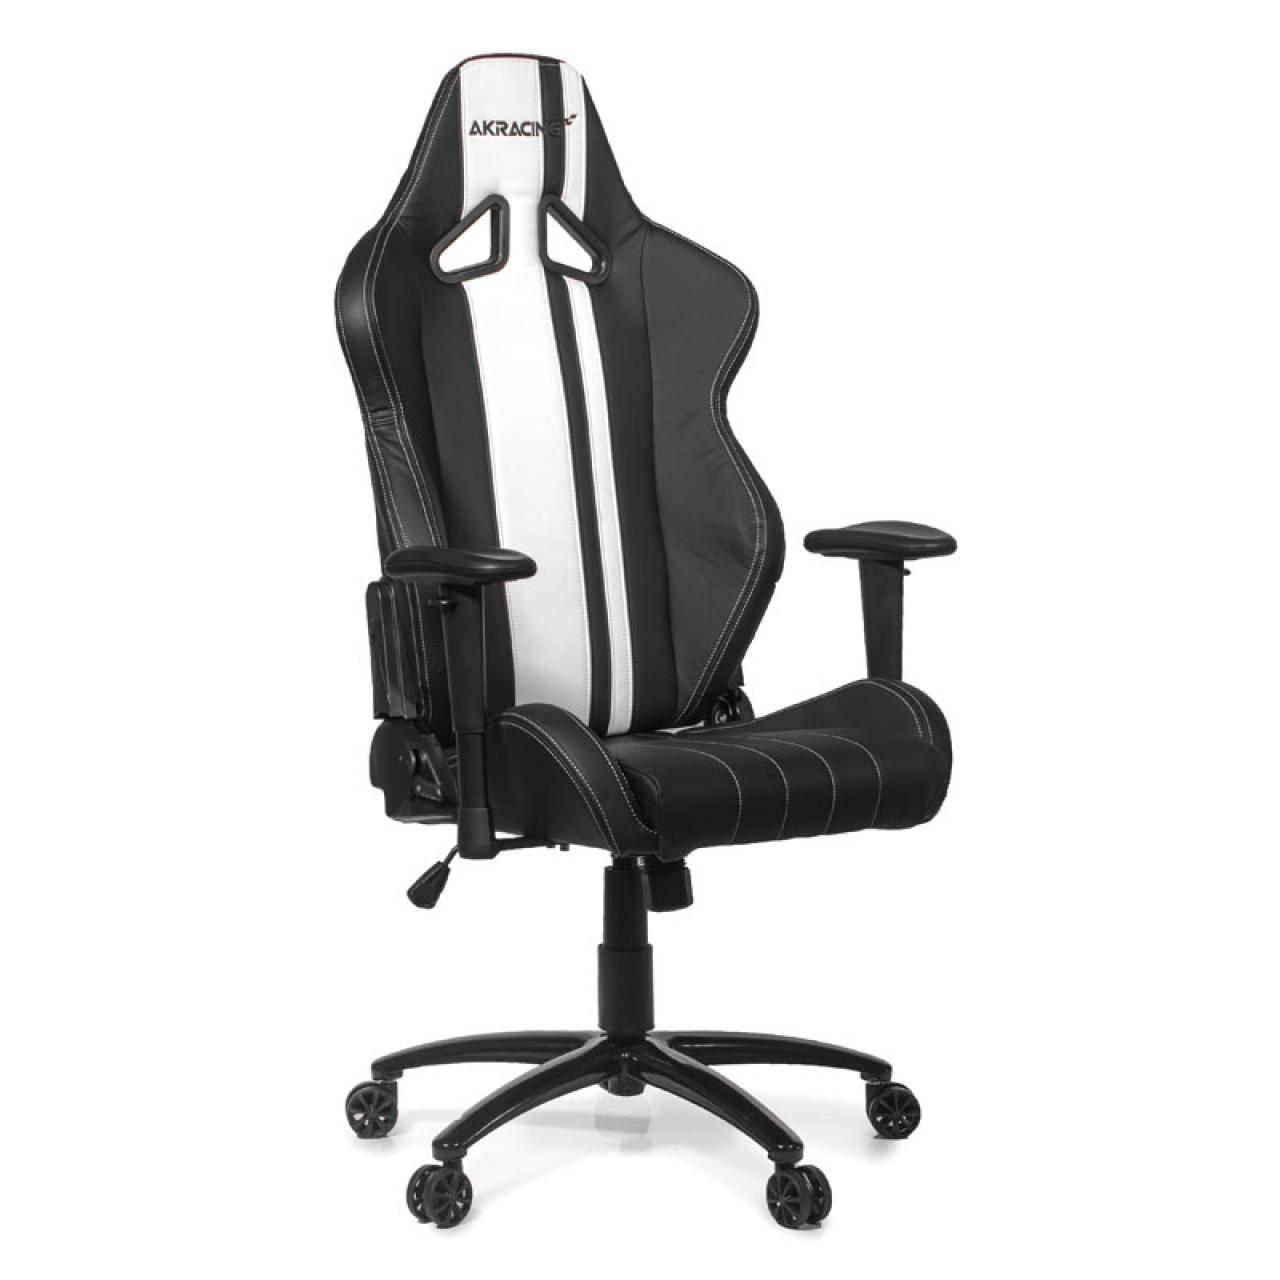 Chair DrehstühleAkracing Gaming Rush Vier In xrQeECBWdo